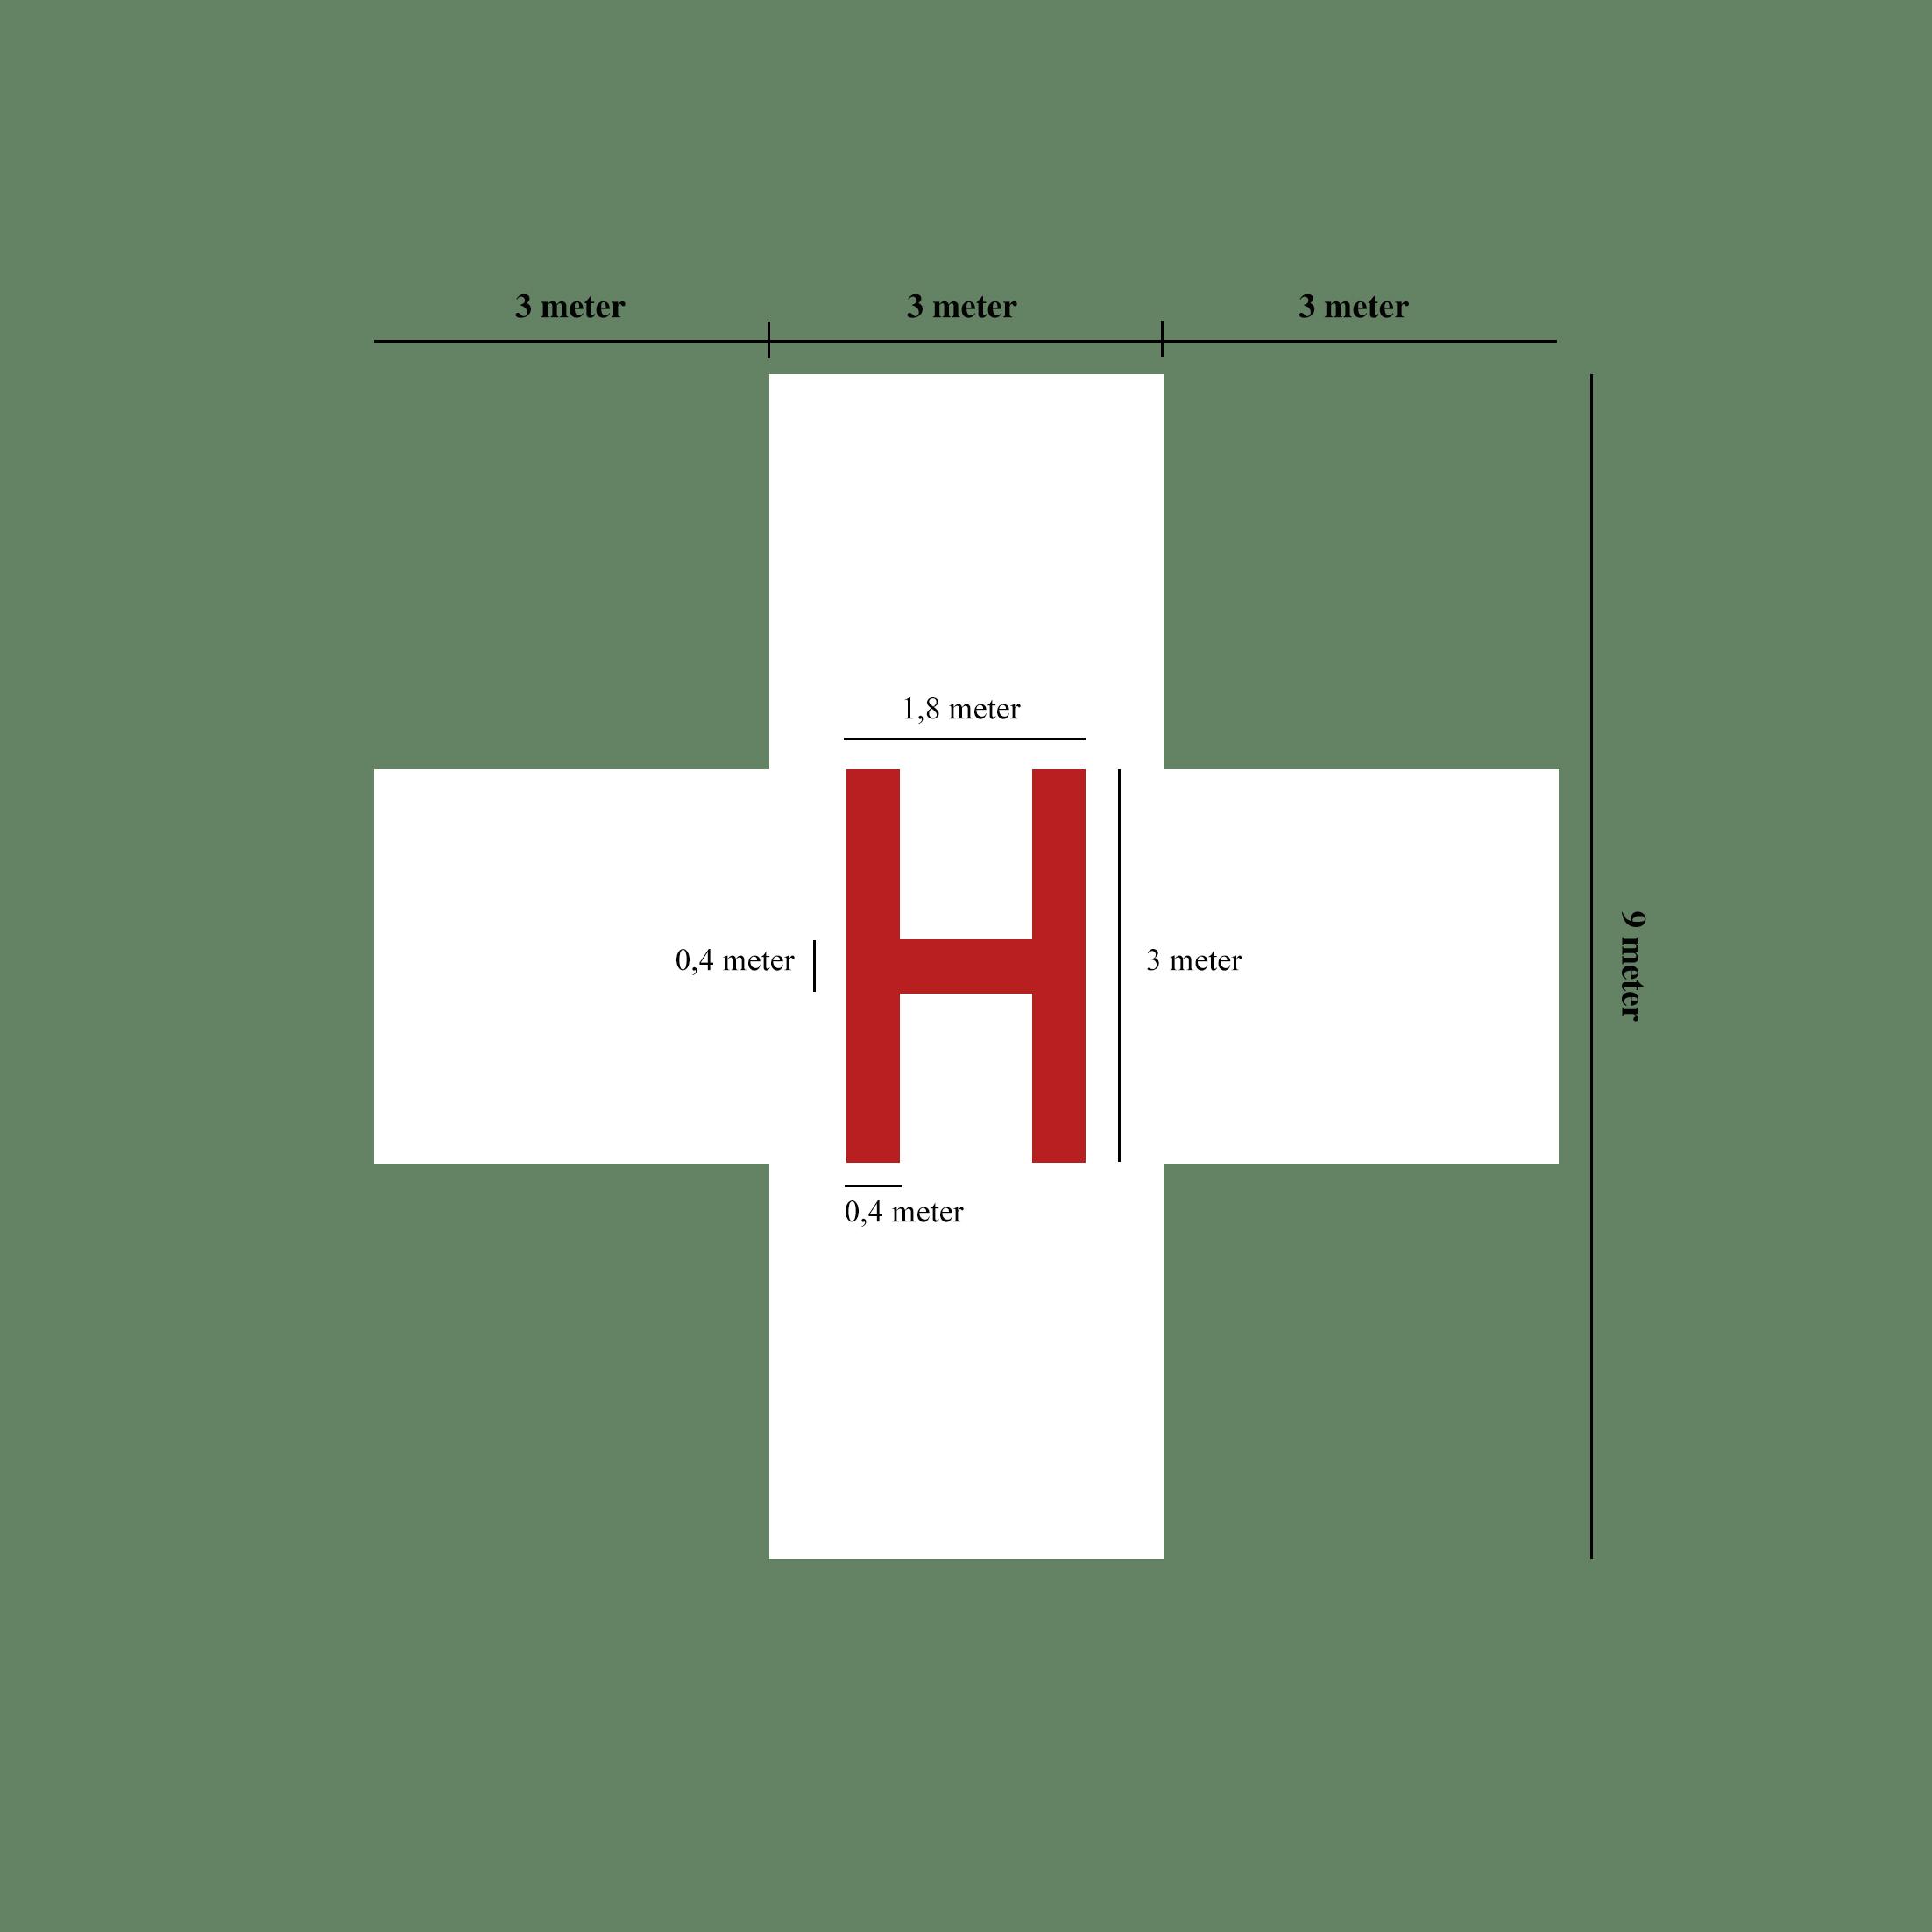 Helipad hopitals - size - 12102015